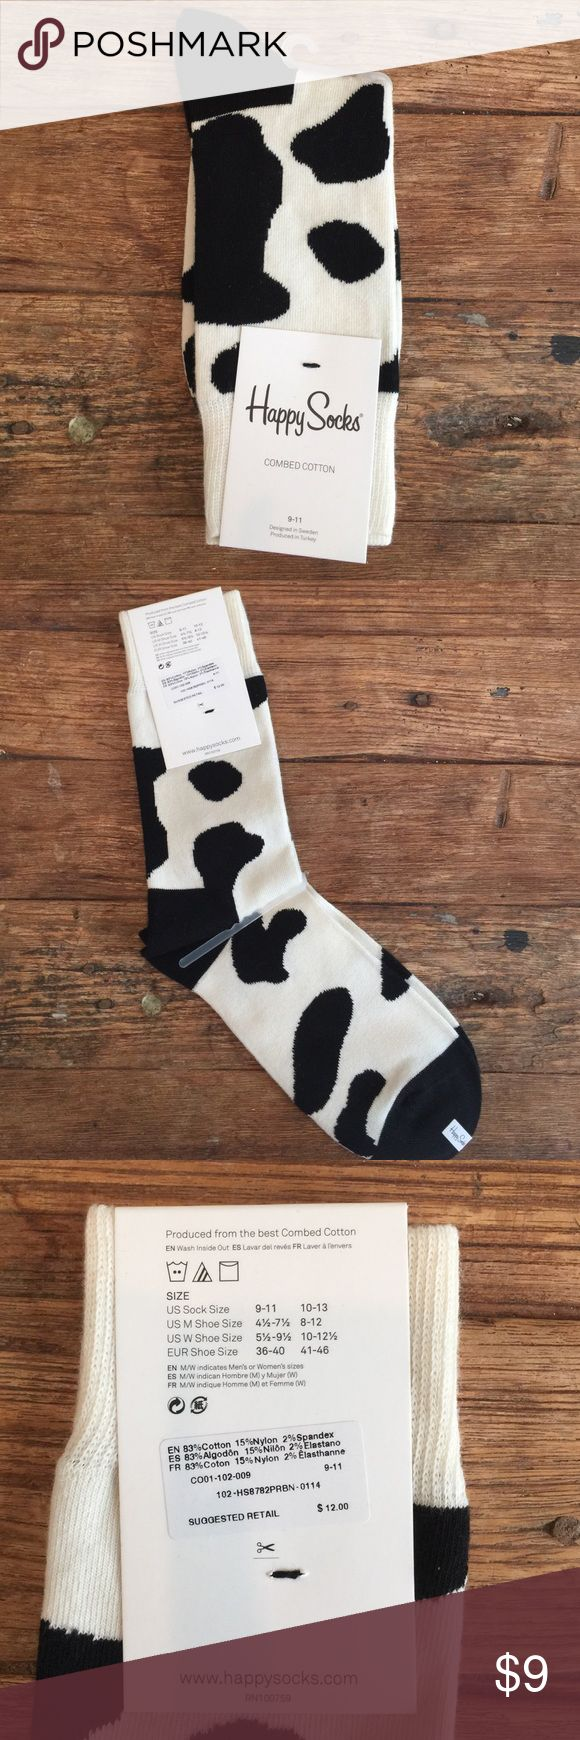 HAPPY SOCKS NEW Cow print Happy Socks! Size 9-11, women's! Super cute and comfortable. Happy Socks Accessories Hosiery & Socks